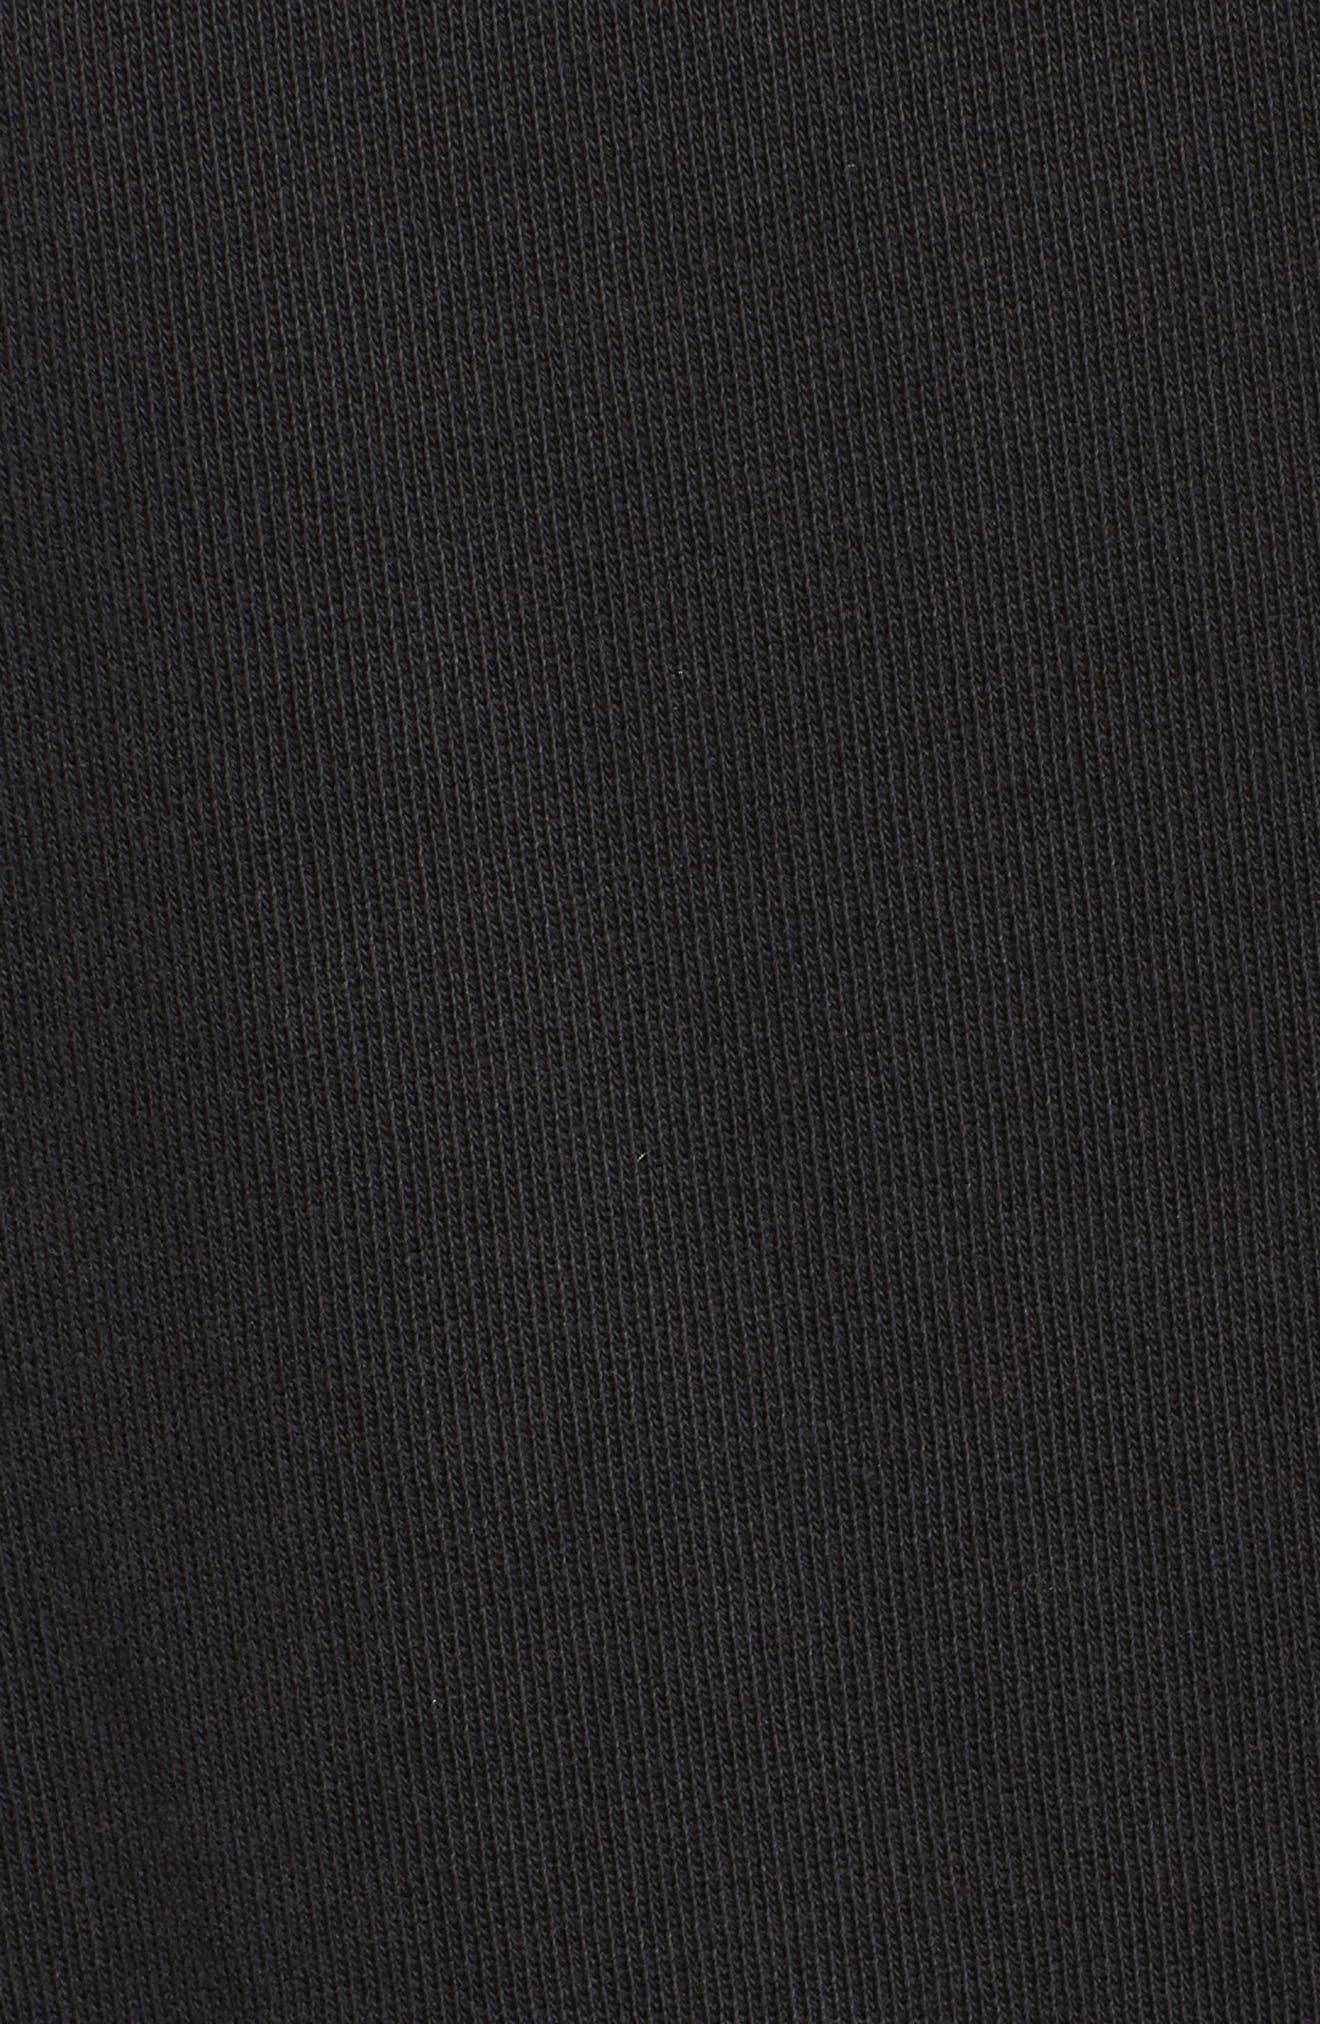 Distressed Boyfriend Sweatshirt,                             Alternate thumbnail 5, color,                             Black